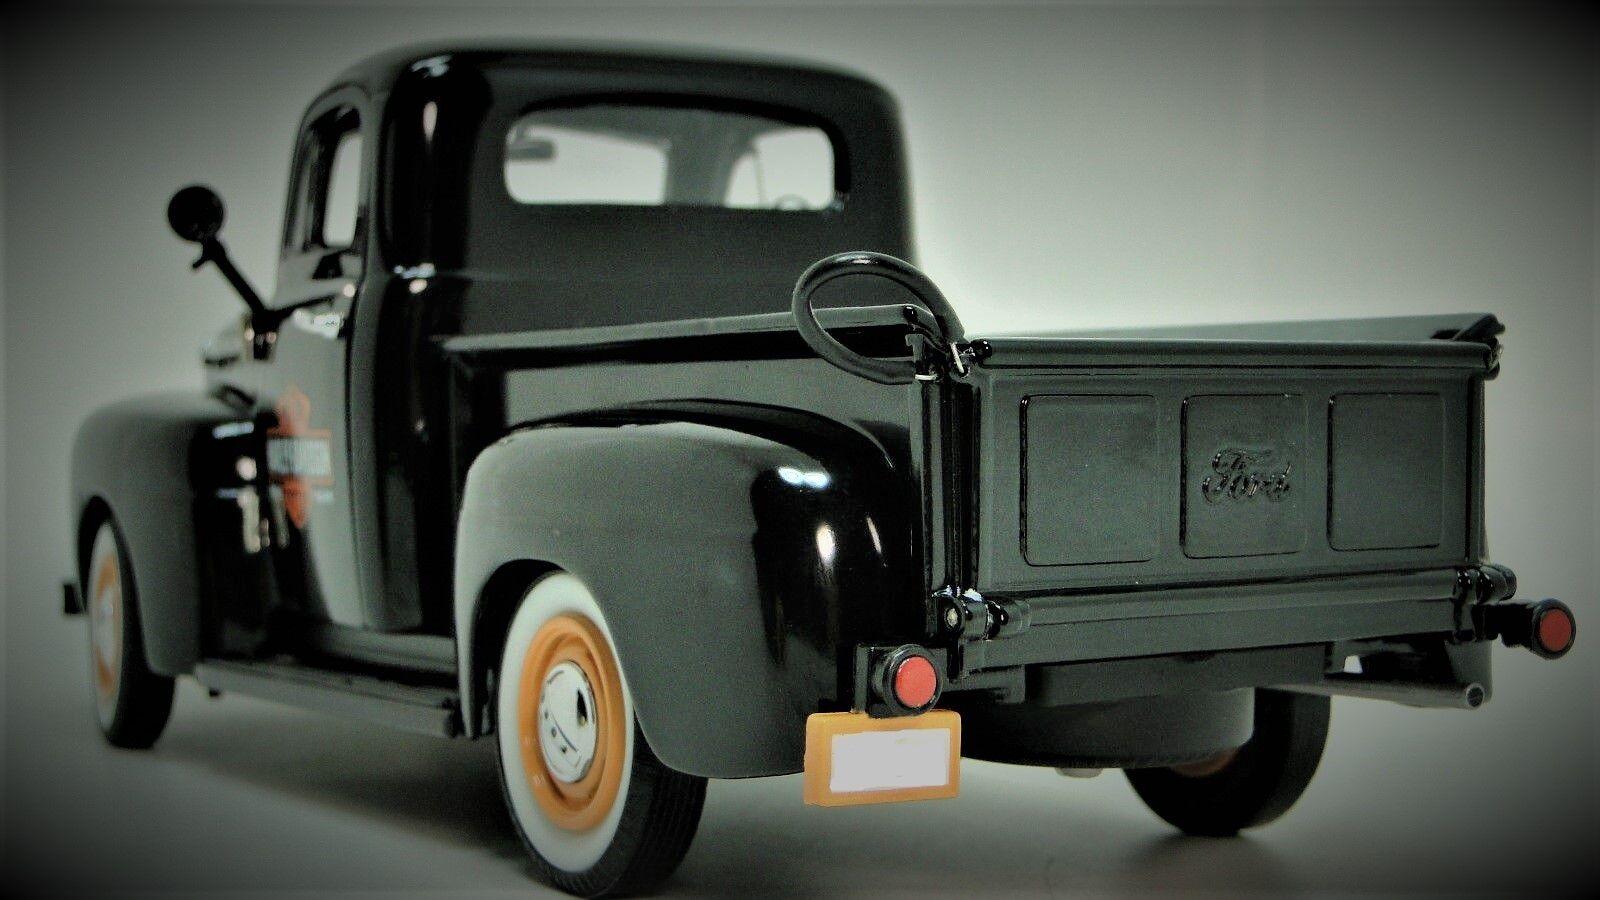 Camioneta Ford 1 1950s coche modelo Vintage 43 Antiguo Metal 12 F150 T 24 18